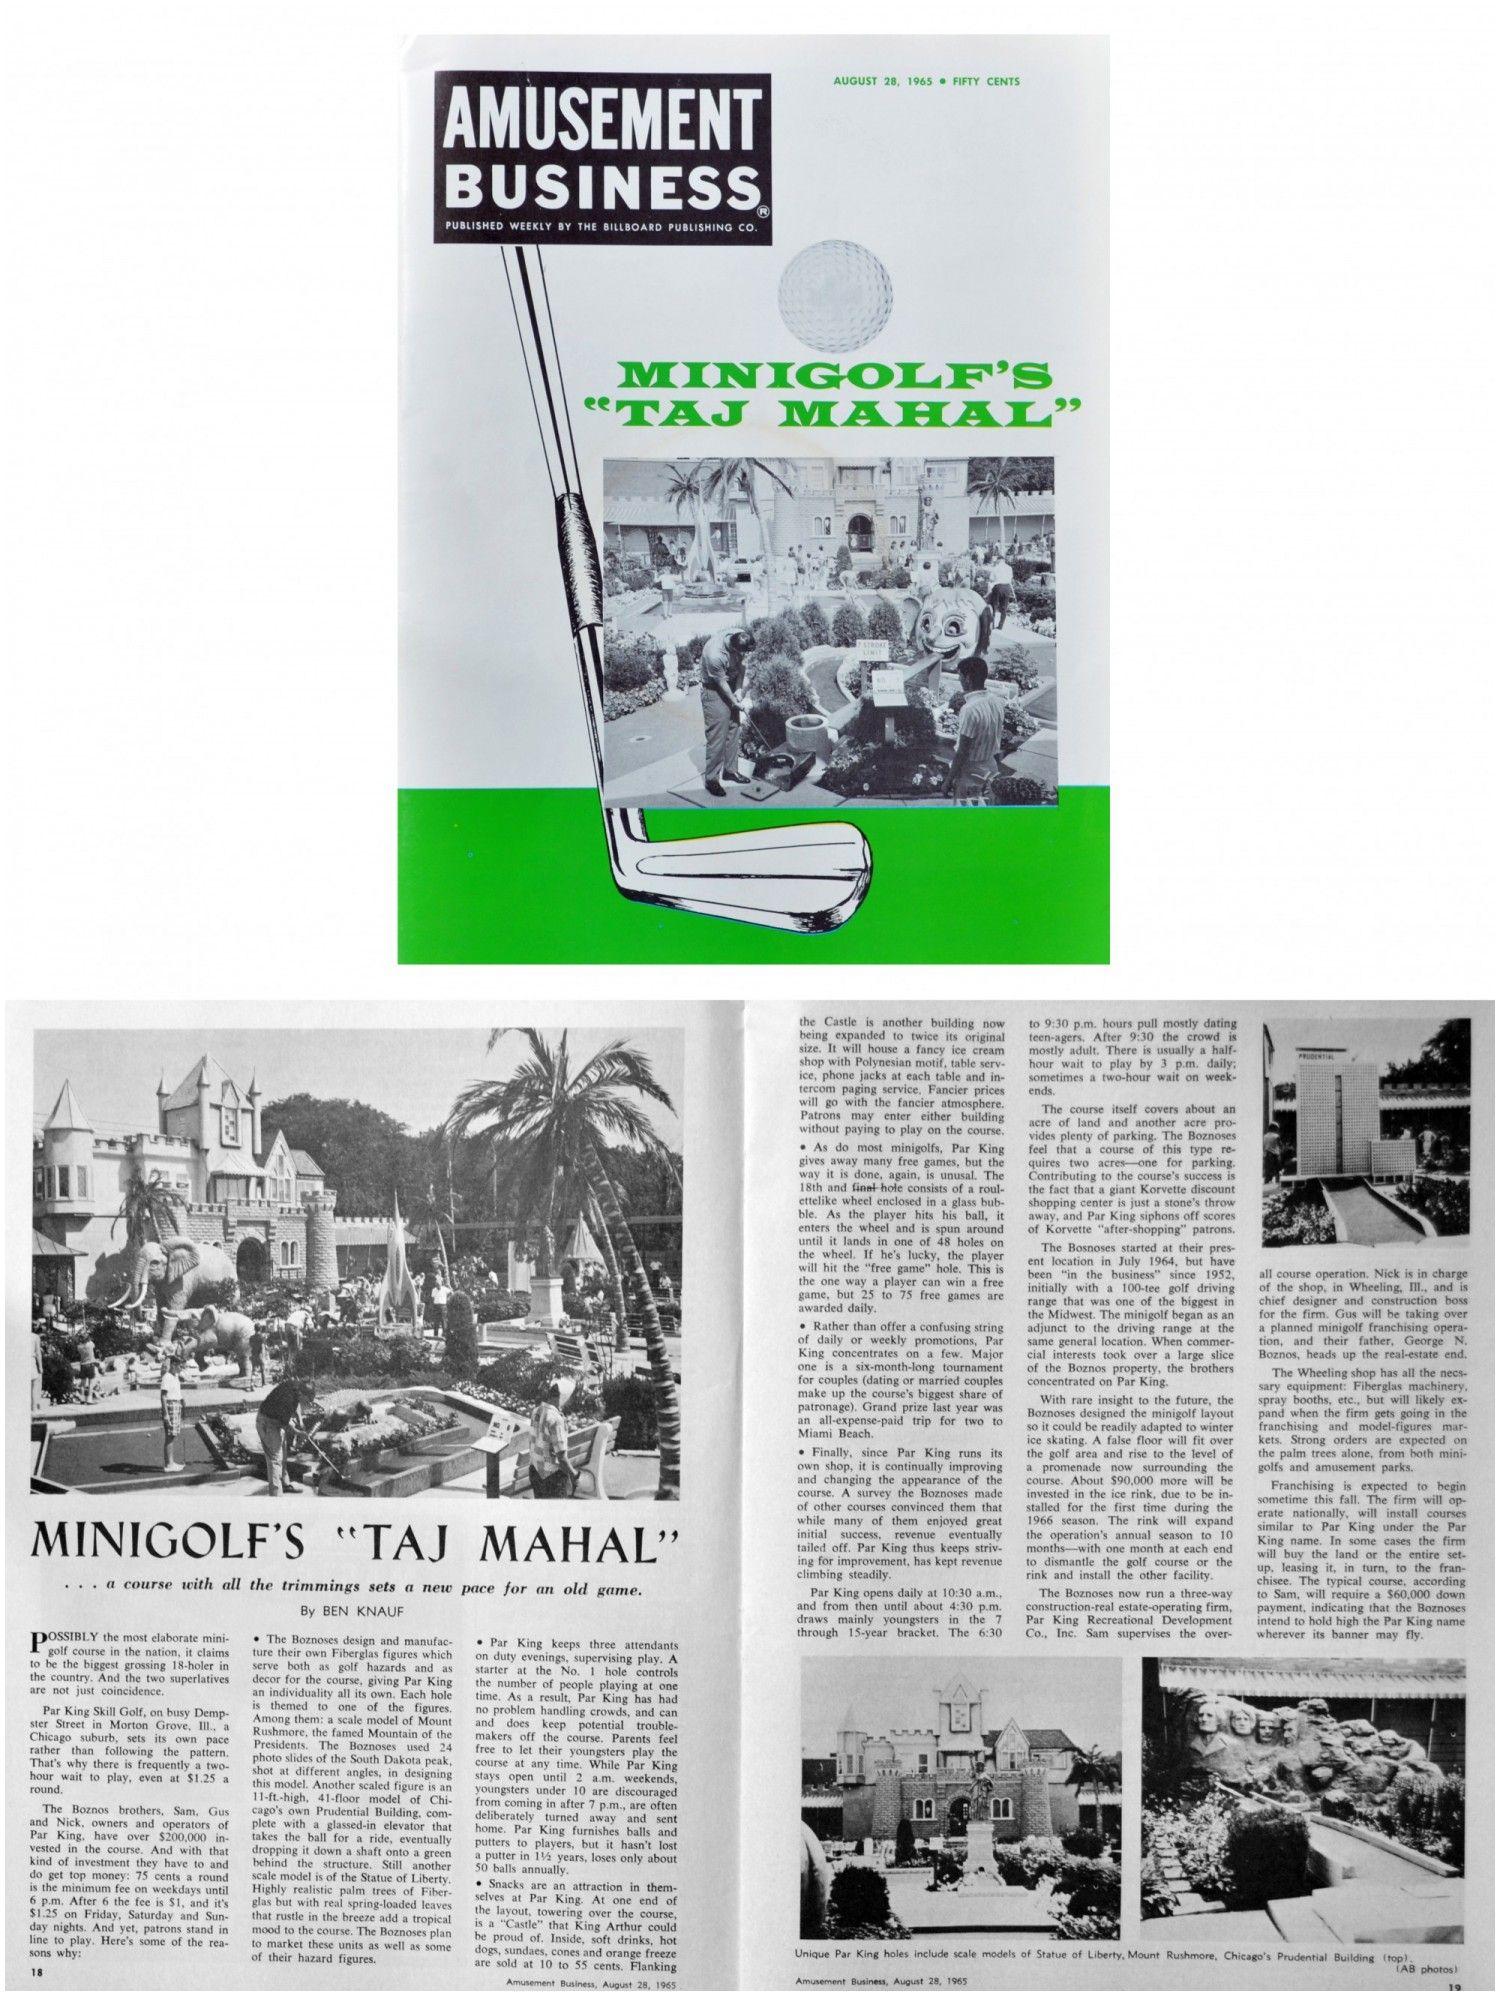 1965 Amusement Business Magazine